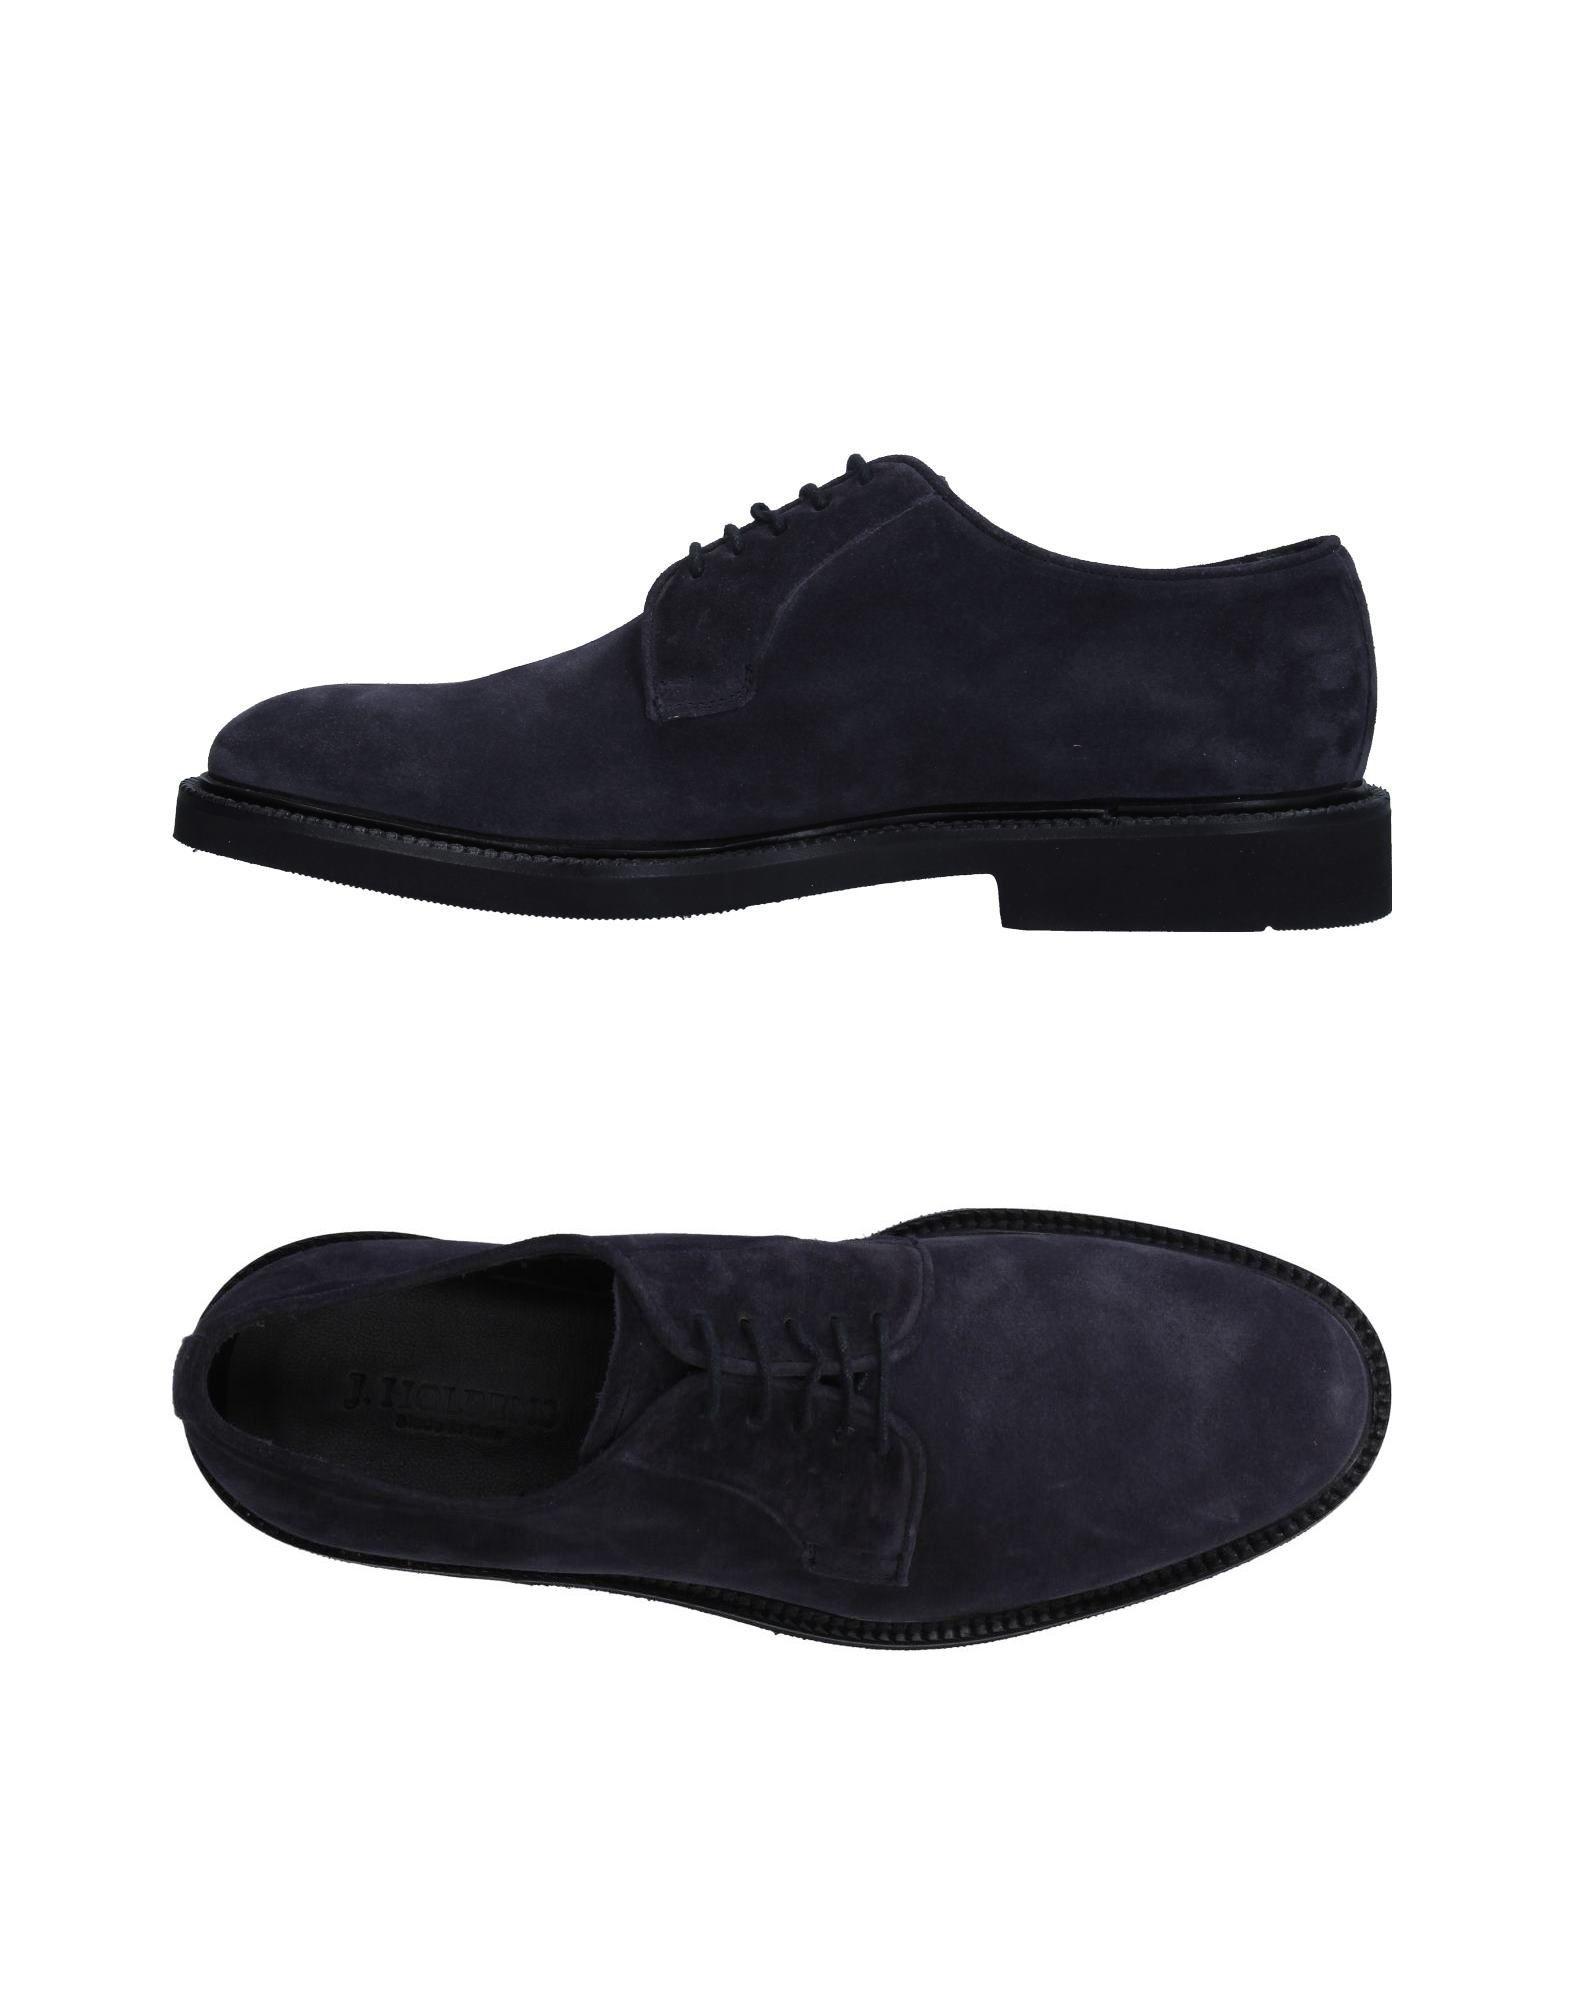 J. HOLBENS Обувь на шнурках цены онлайн